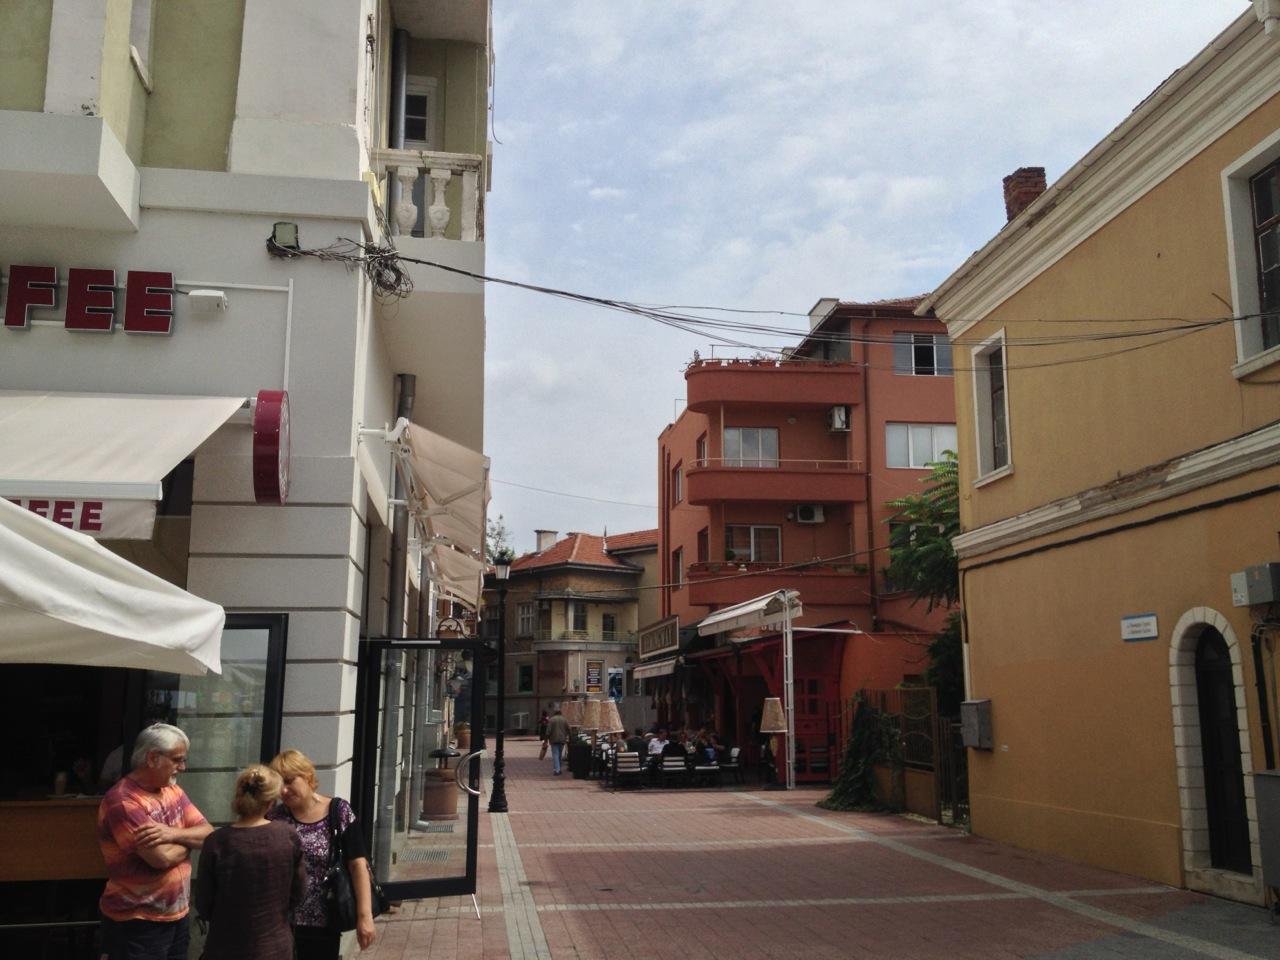 Somewhere in Plovdiv